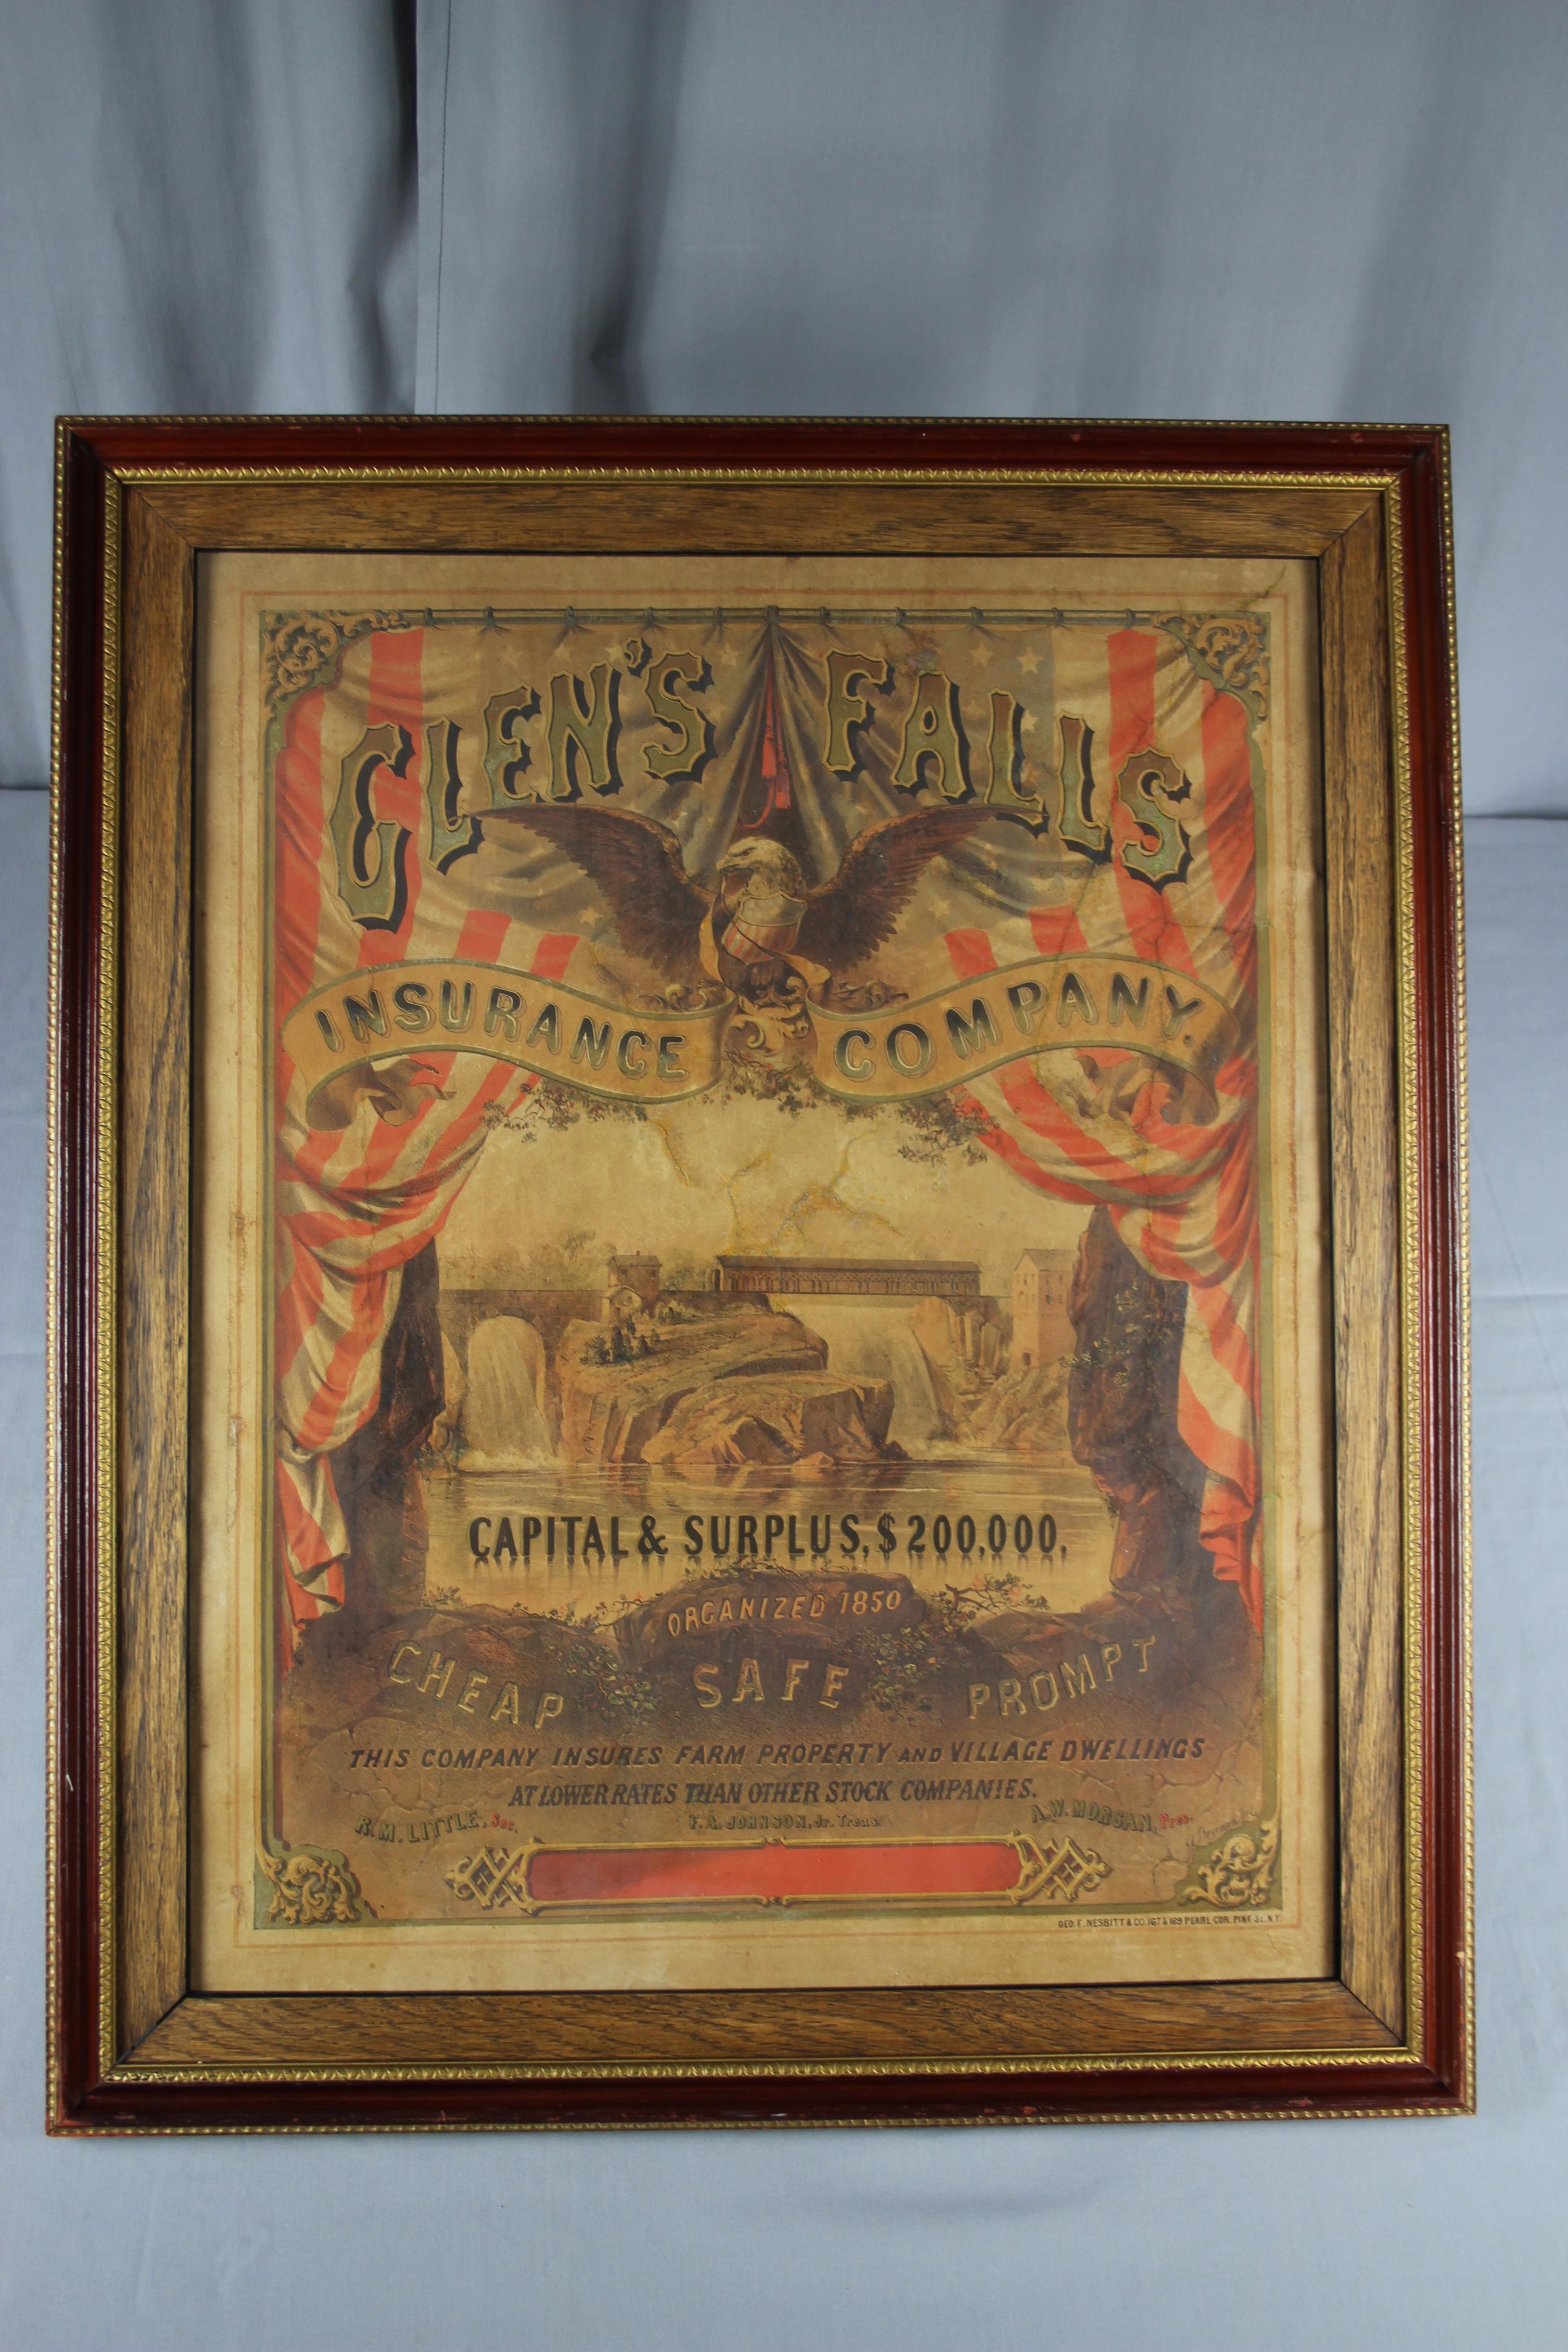 Paper Conservation, art conservation, professional conservator, 19th century lithograph, after treatment photo, antique poster, vintage poster repair, restore, preserve, preservation, restoration.